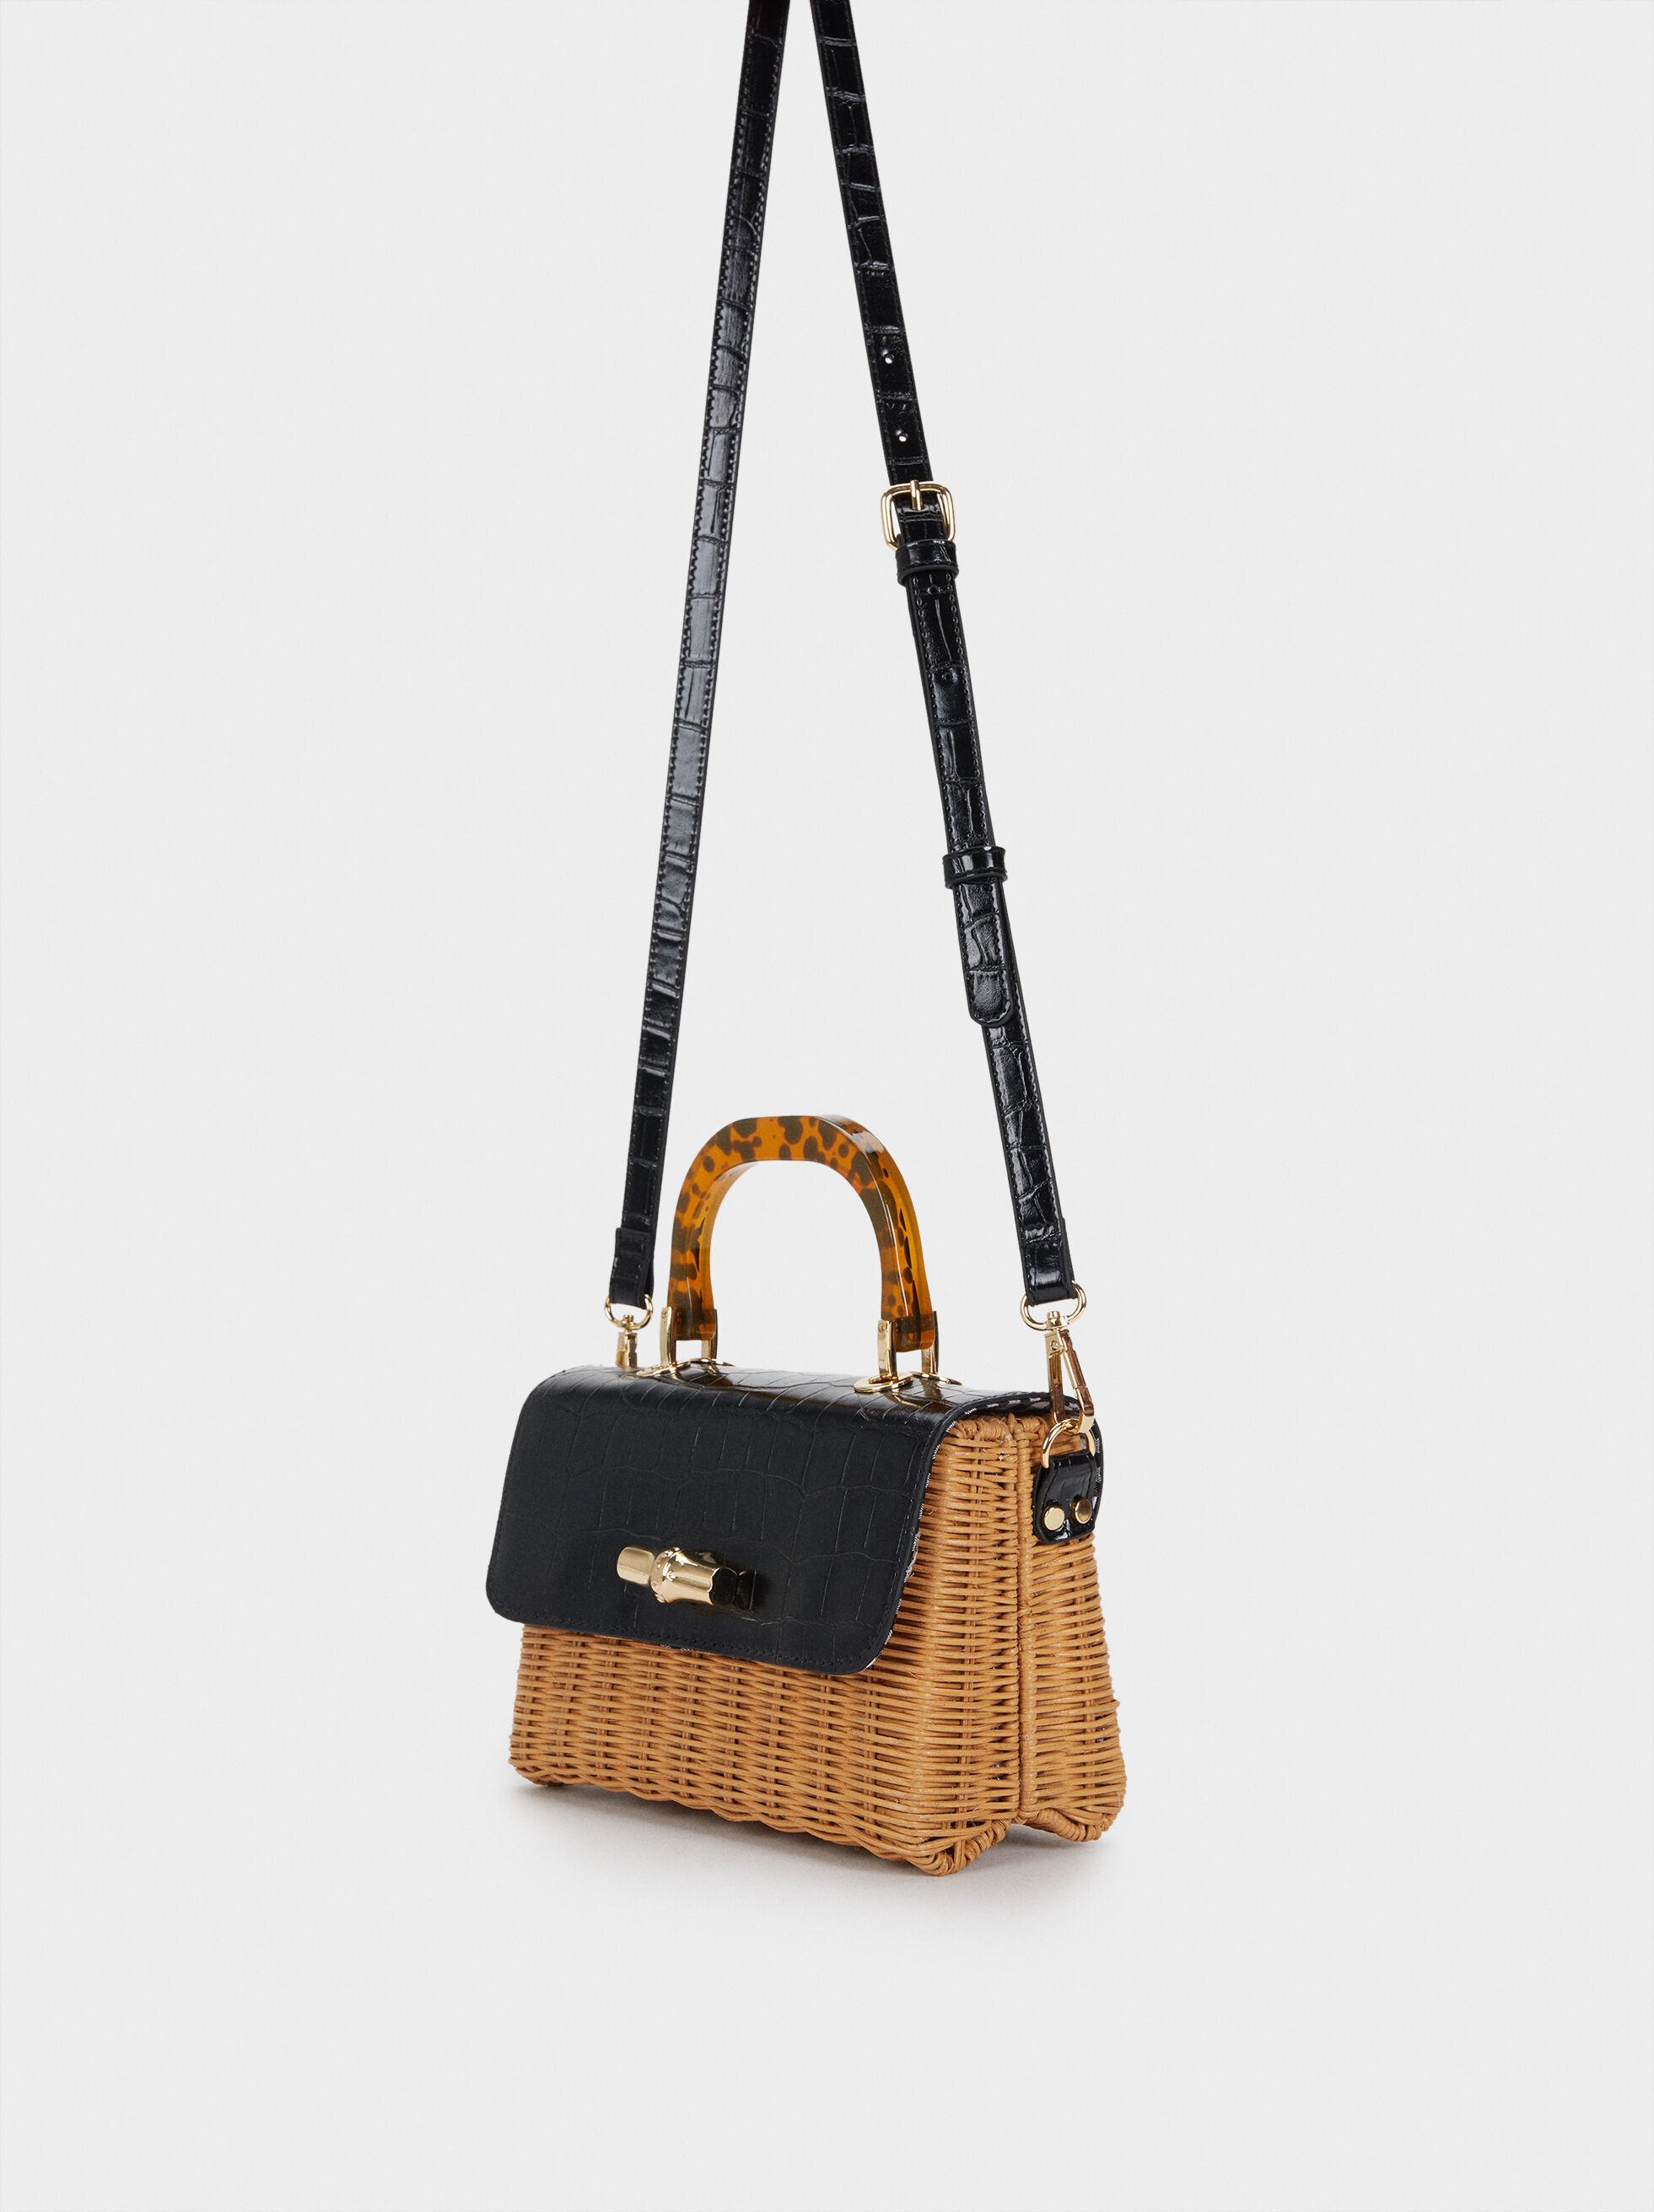 Straw Crossbody Bag With Flap, Camel, hi-res